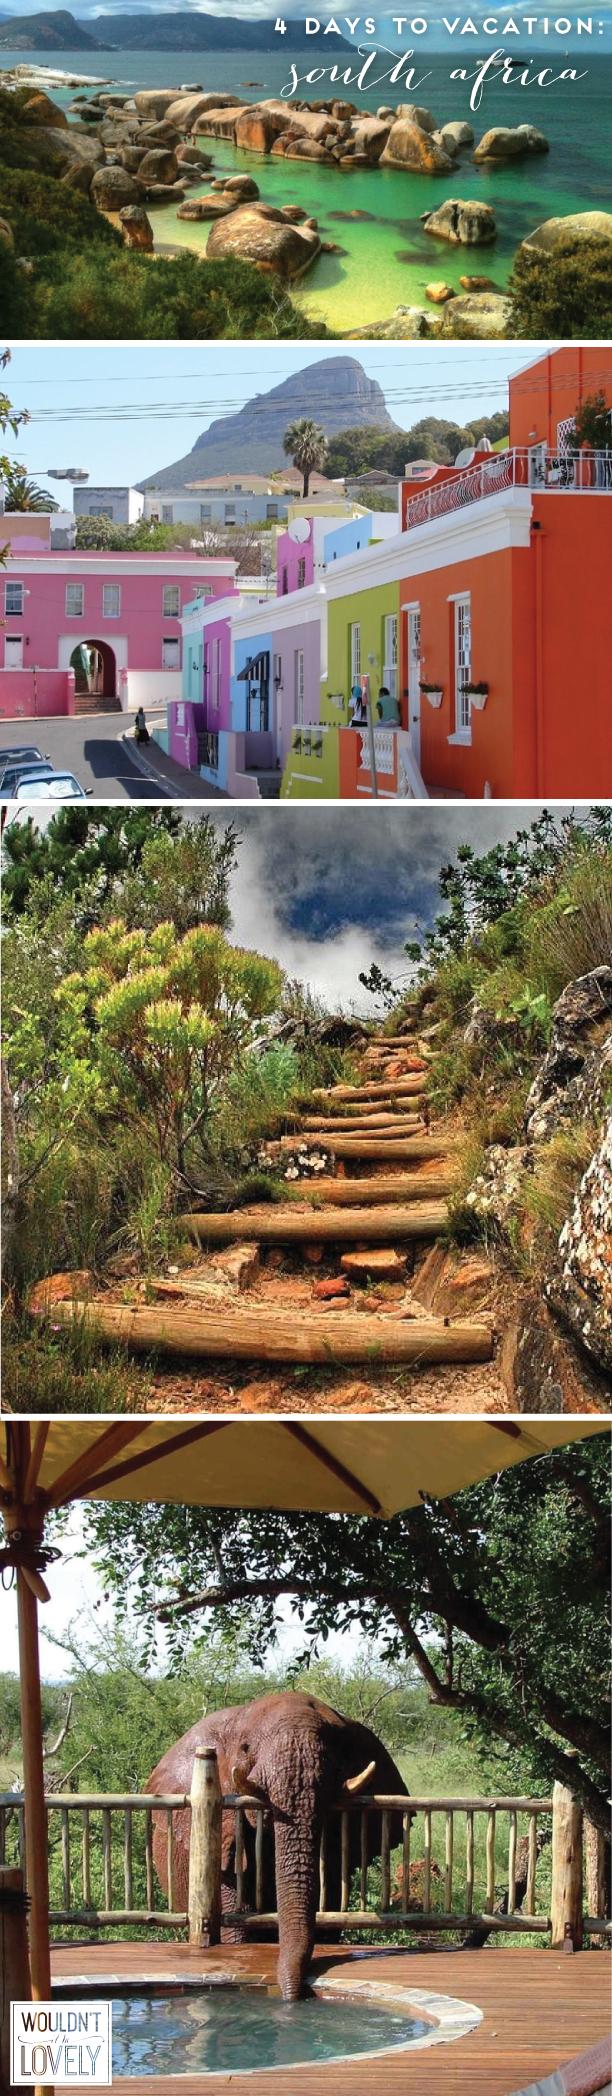 boulder beach ,  bo-kaap ,  table mountain ,  safari